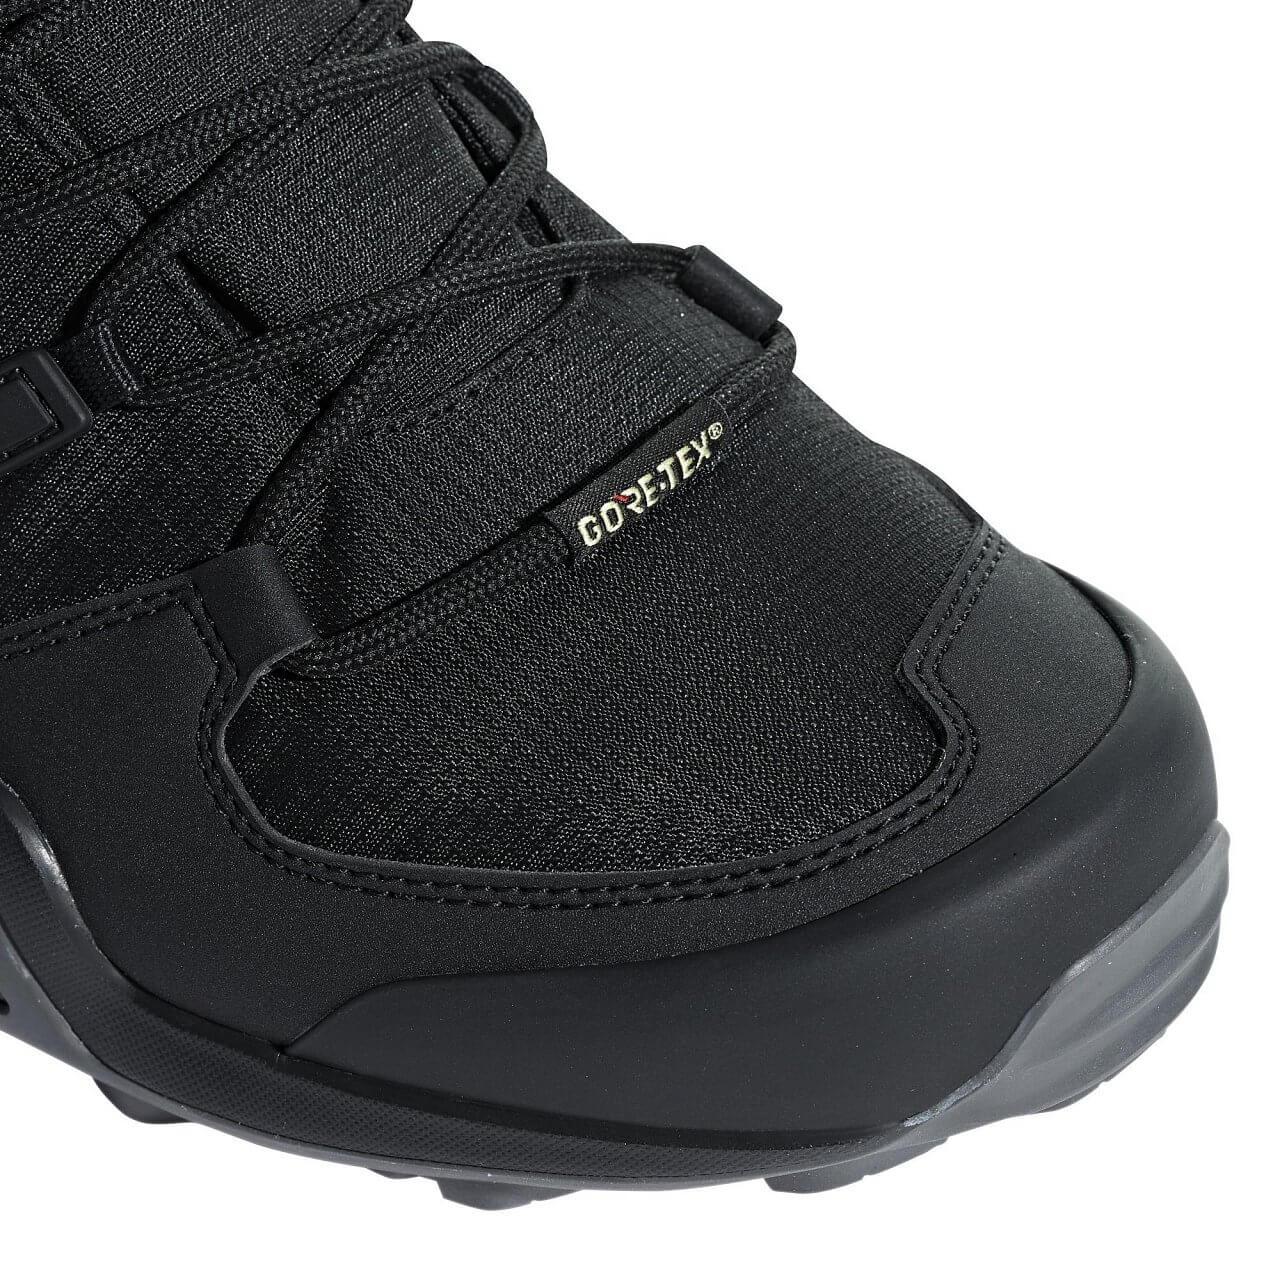 adidas Terrex Swift R2 Mid GTX - pánské outdoorové boty  de3e4dc4f5